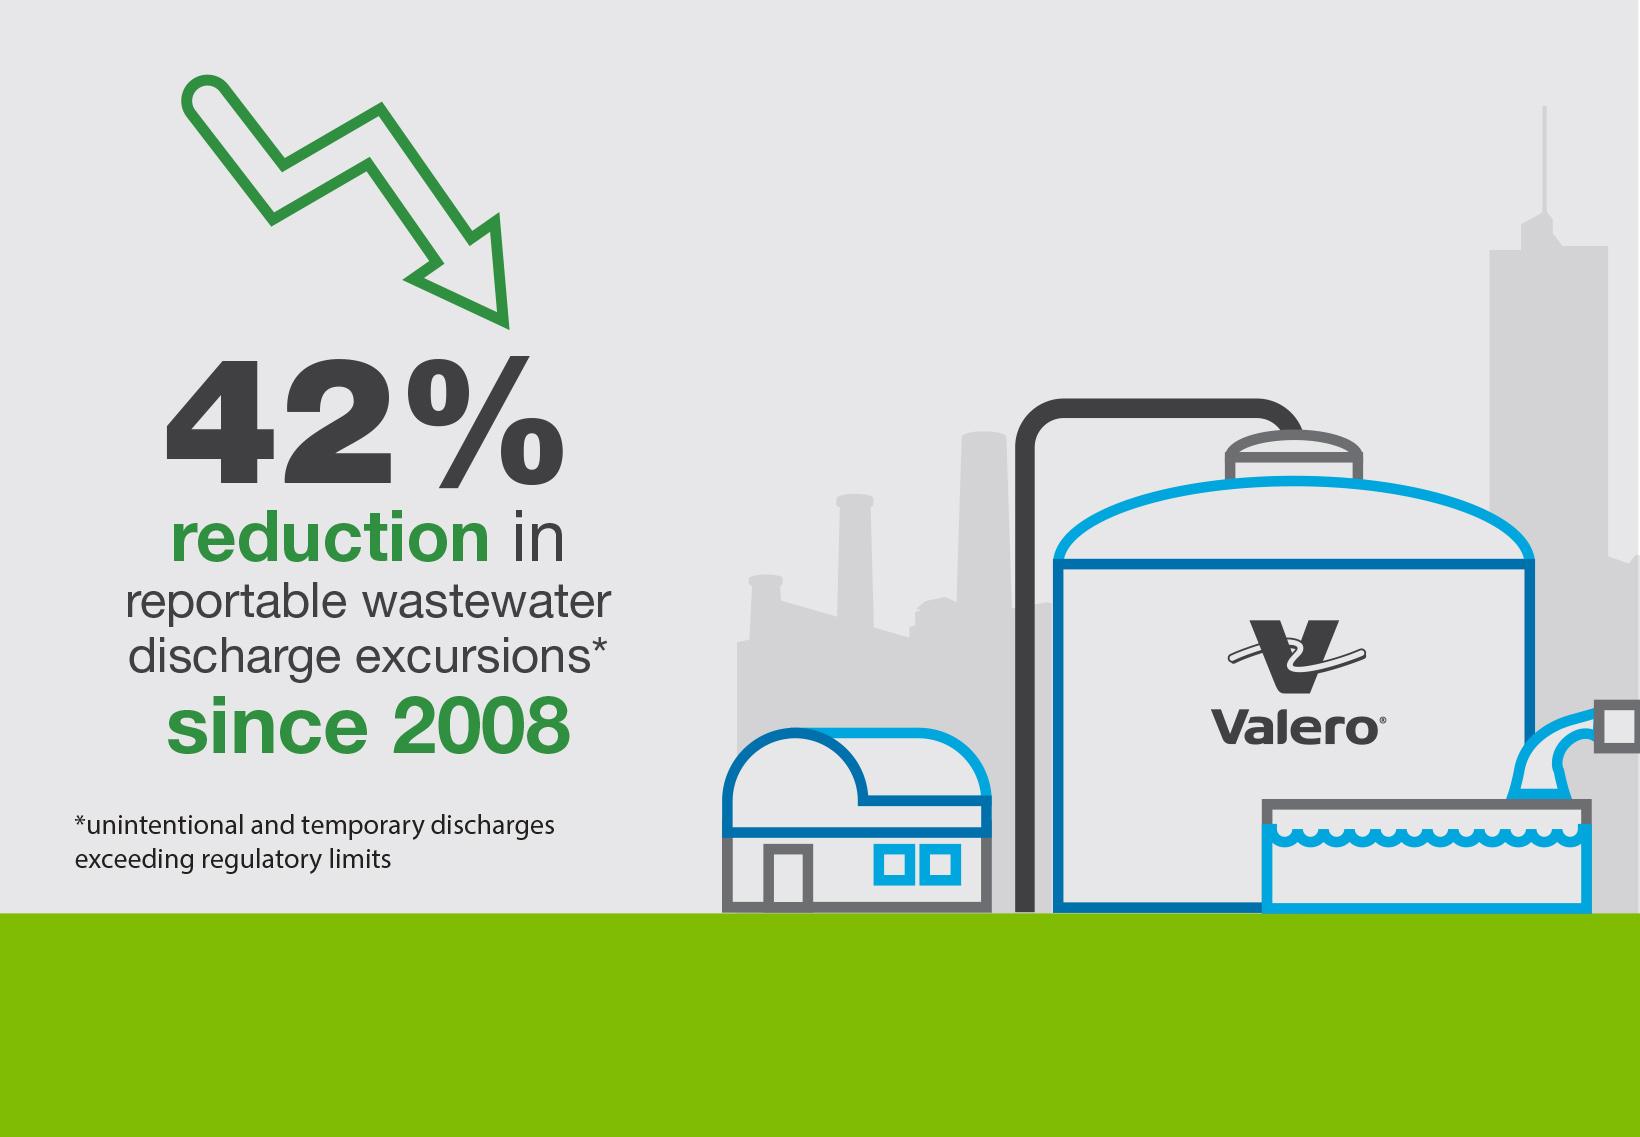 Valero Wastewater Management Infographic